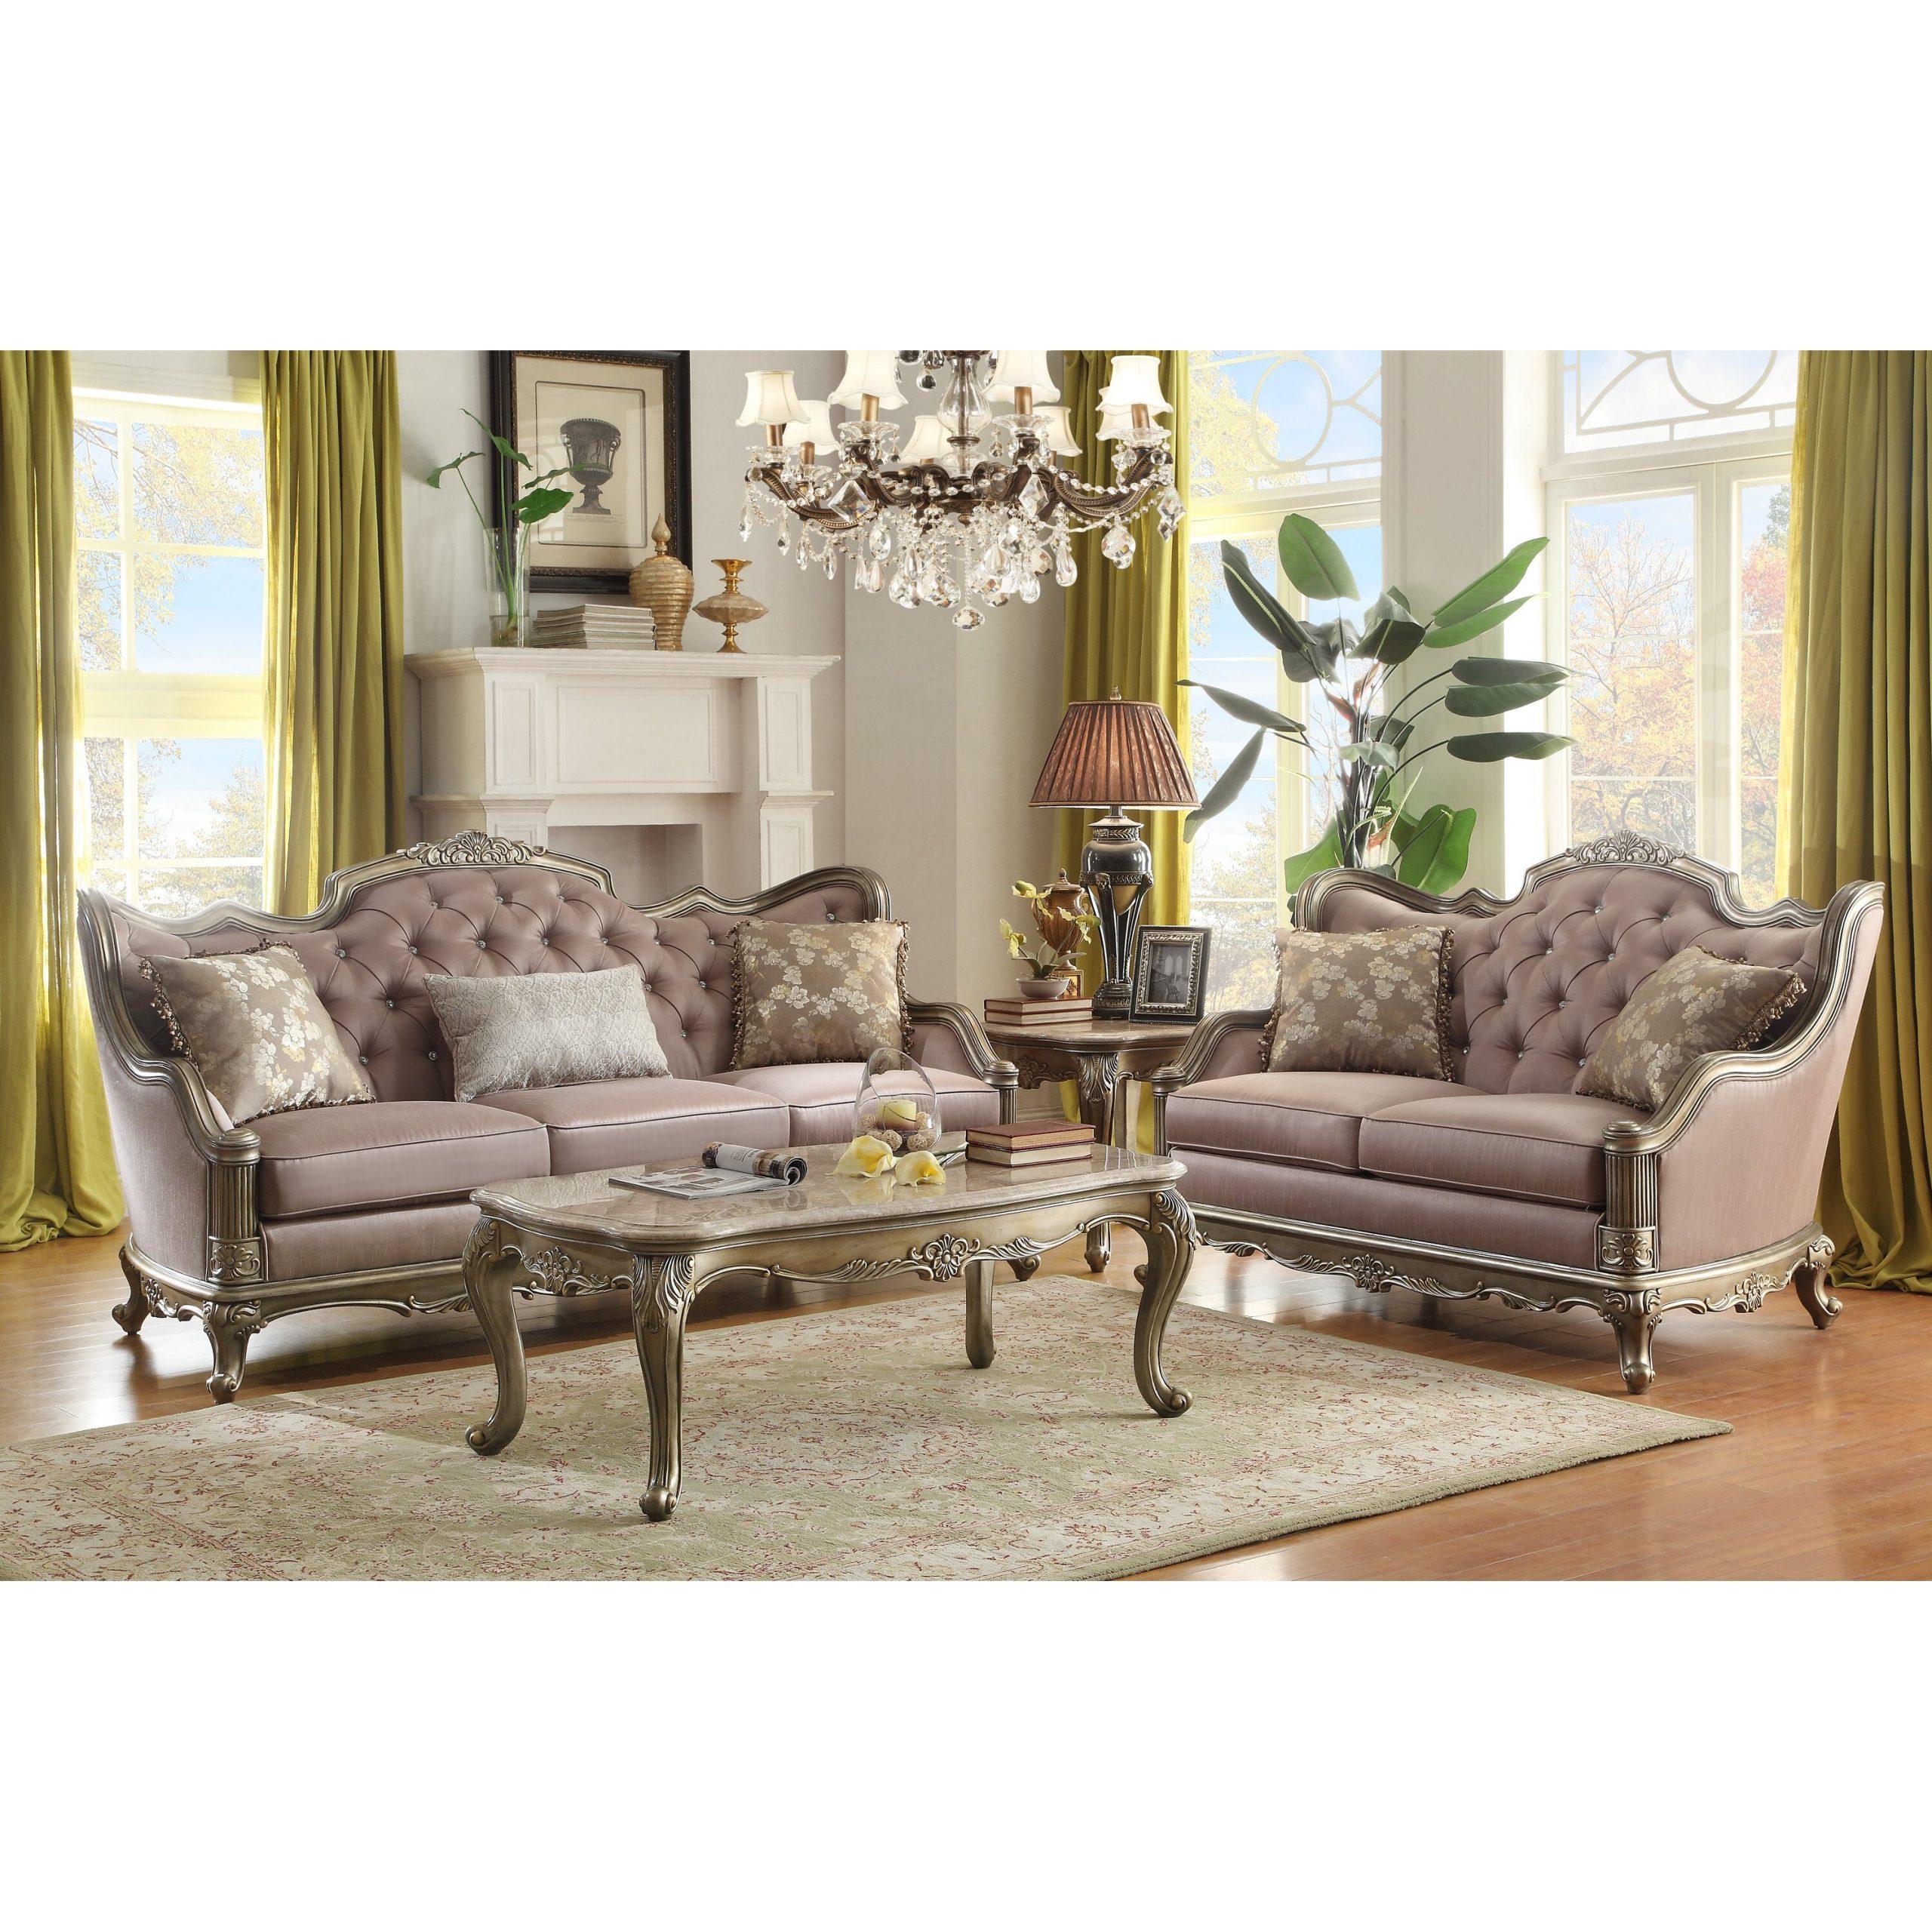 House Of Hampton Sorinne Sofa & Reviews | Wayfair With Hamptons Sofas (View 10 of 15)